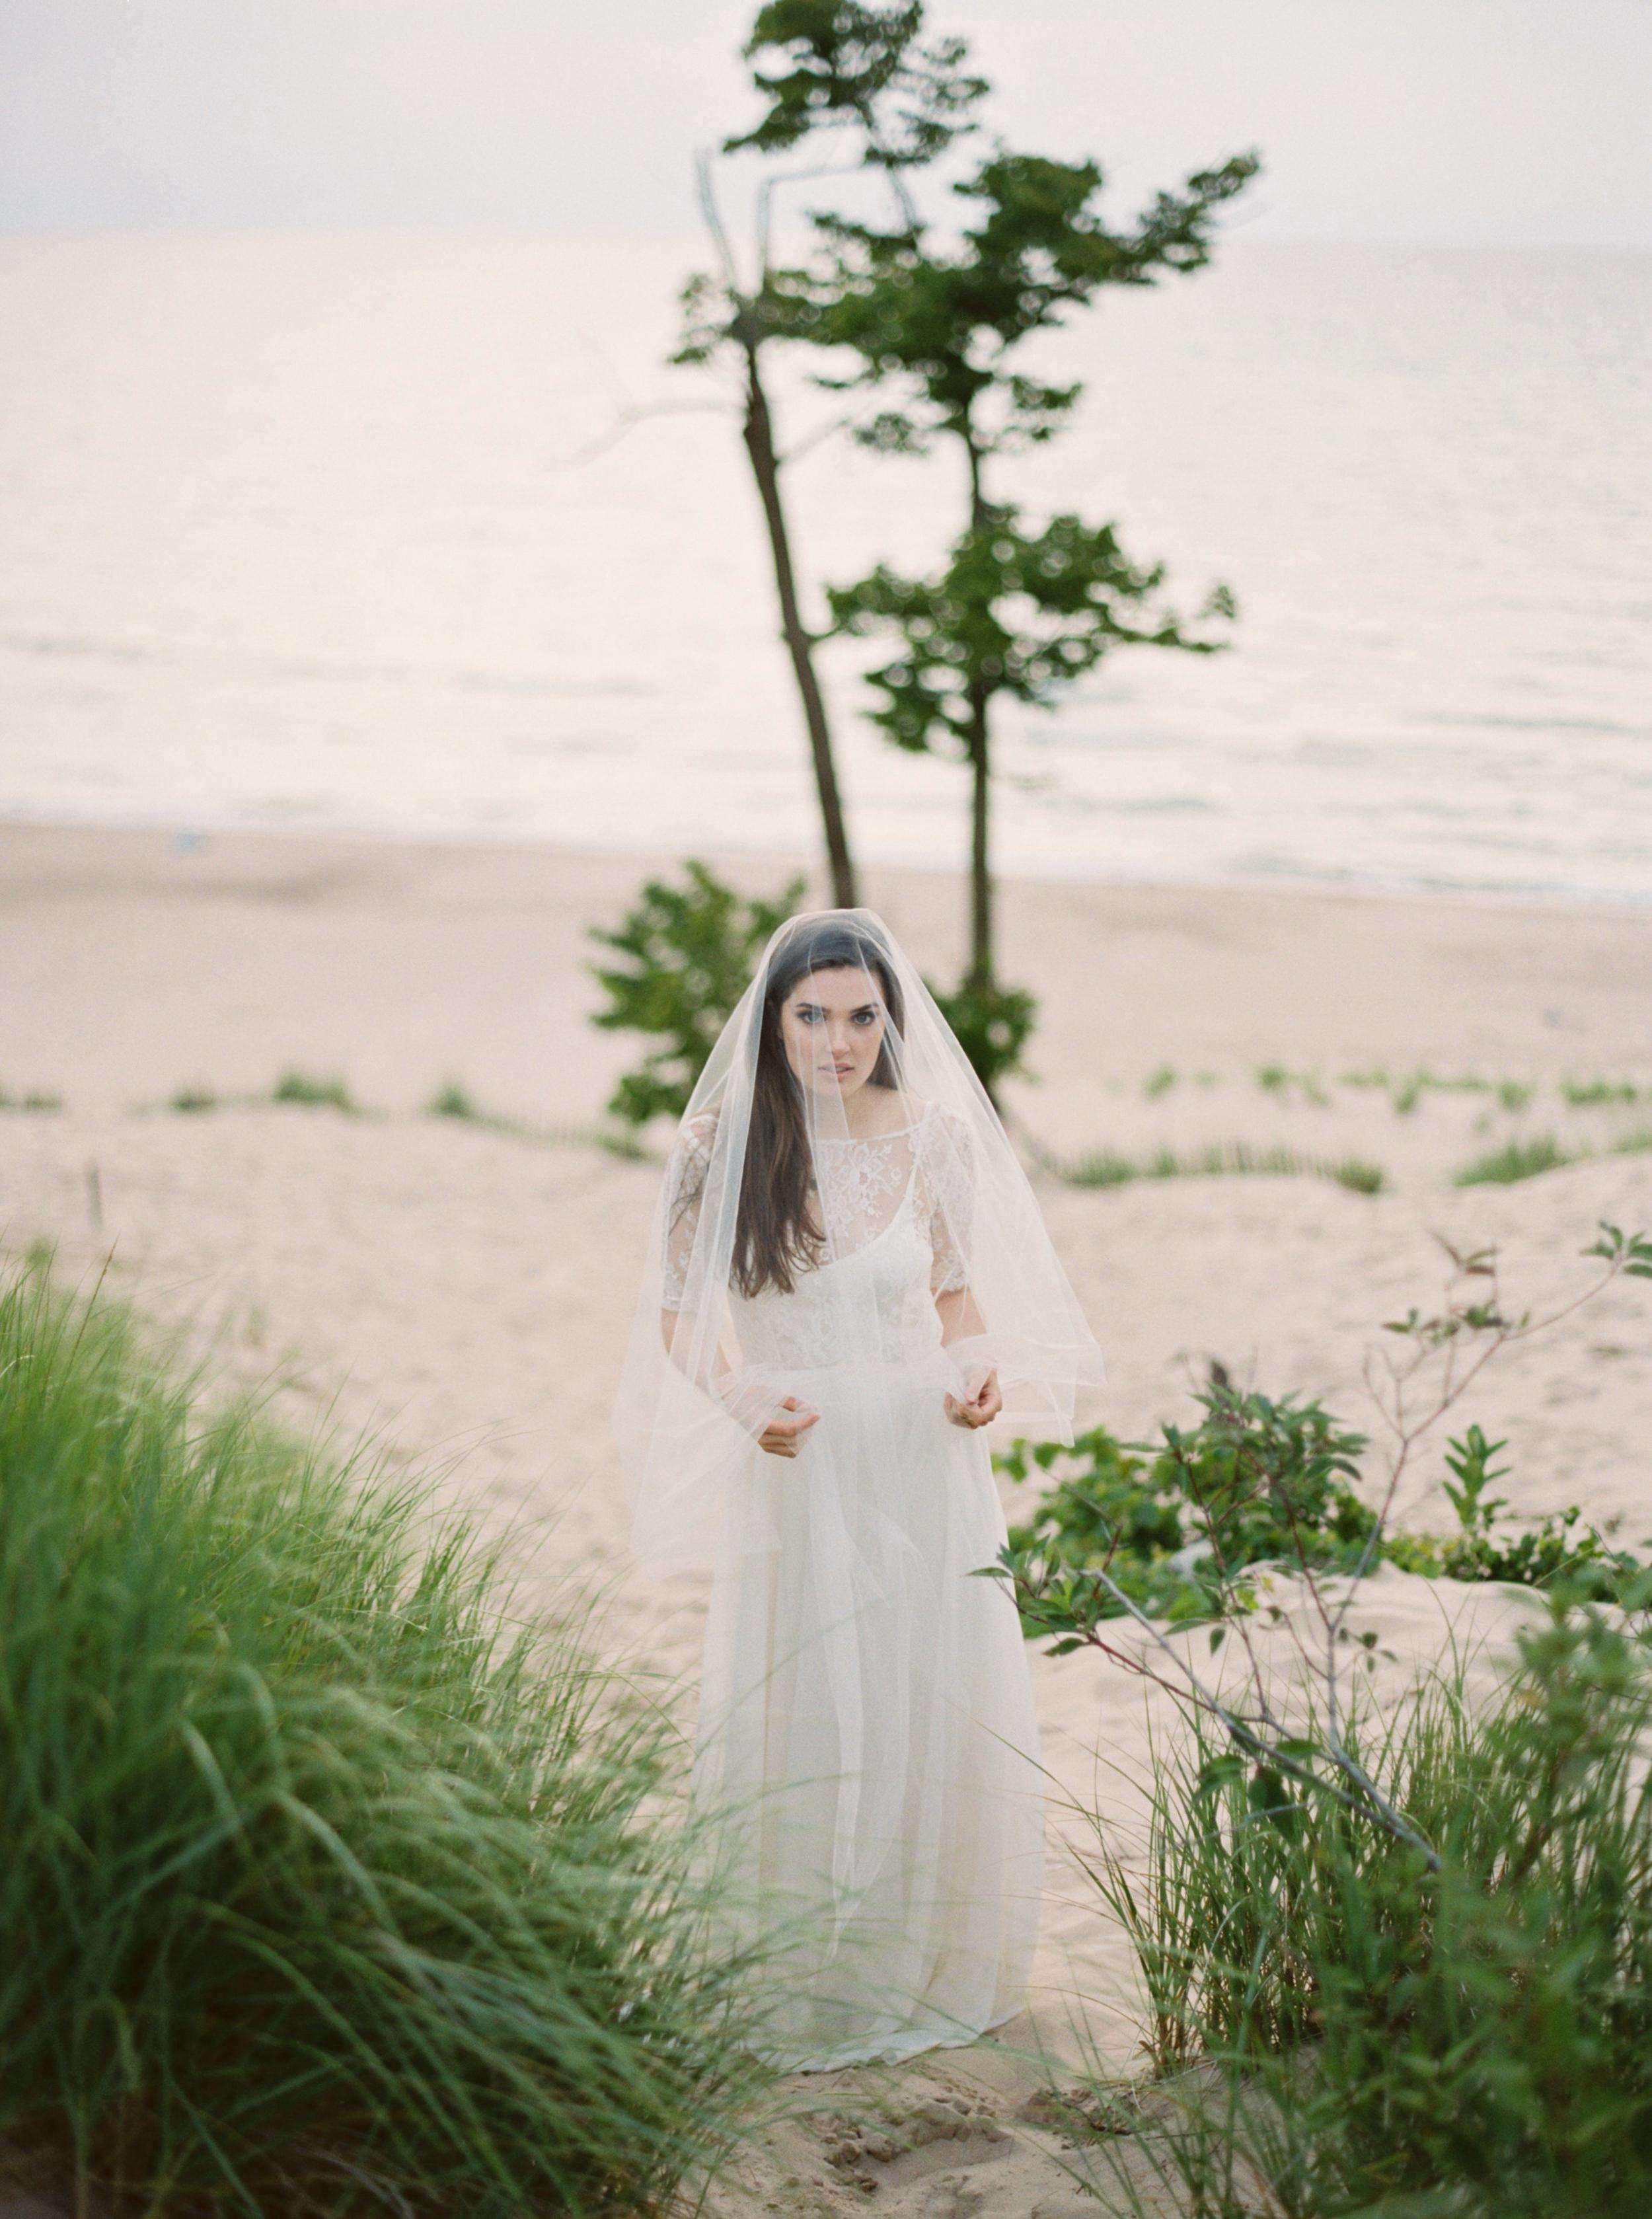 Kyle John l Fine Art Wedding Photography l Chicago, Copenhagen, California, New York, Destination l Blog l Jessica W_22